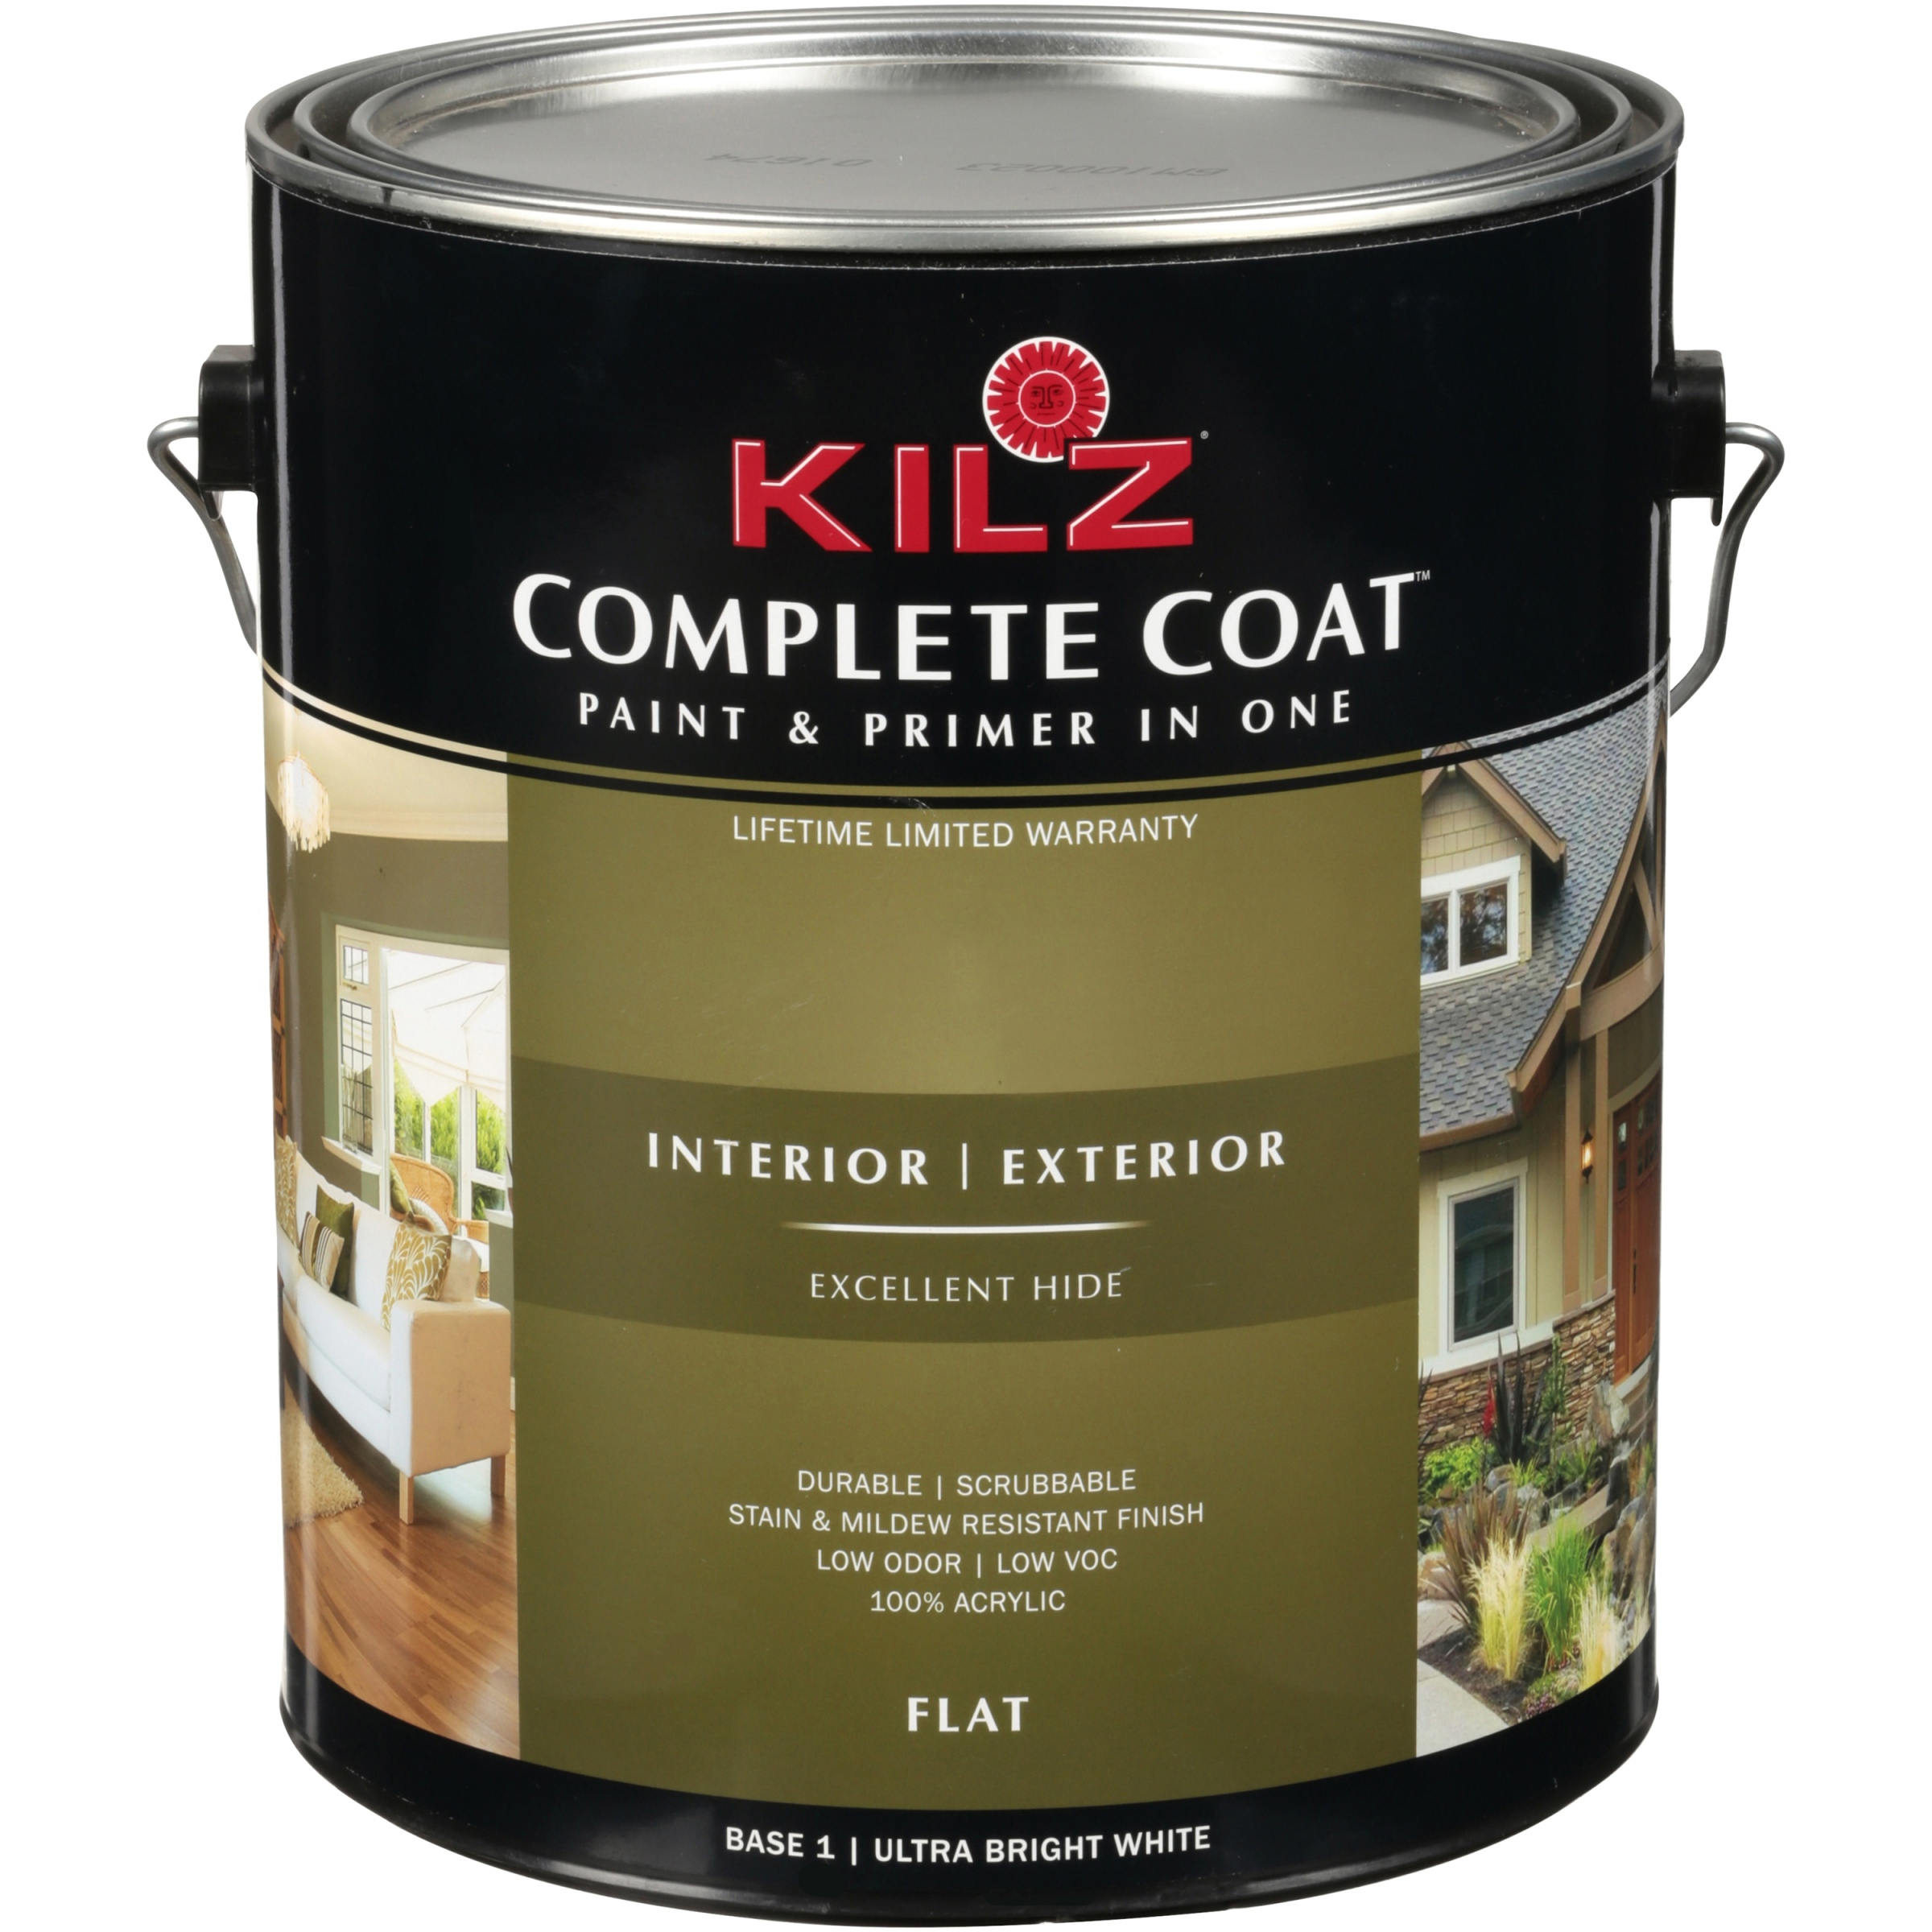 kilz exterior primer temperature kilz 2 primer temperature new drywall sds oil based exterior